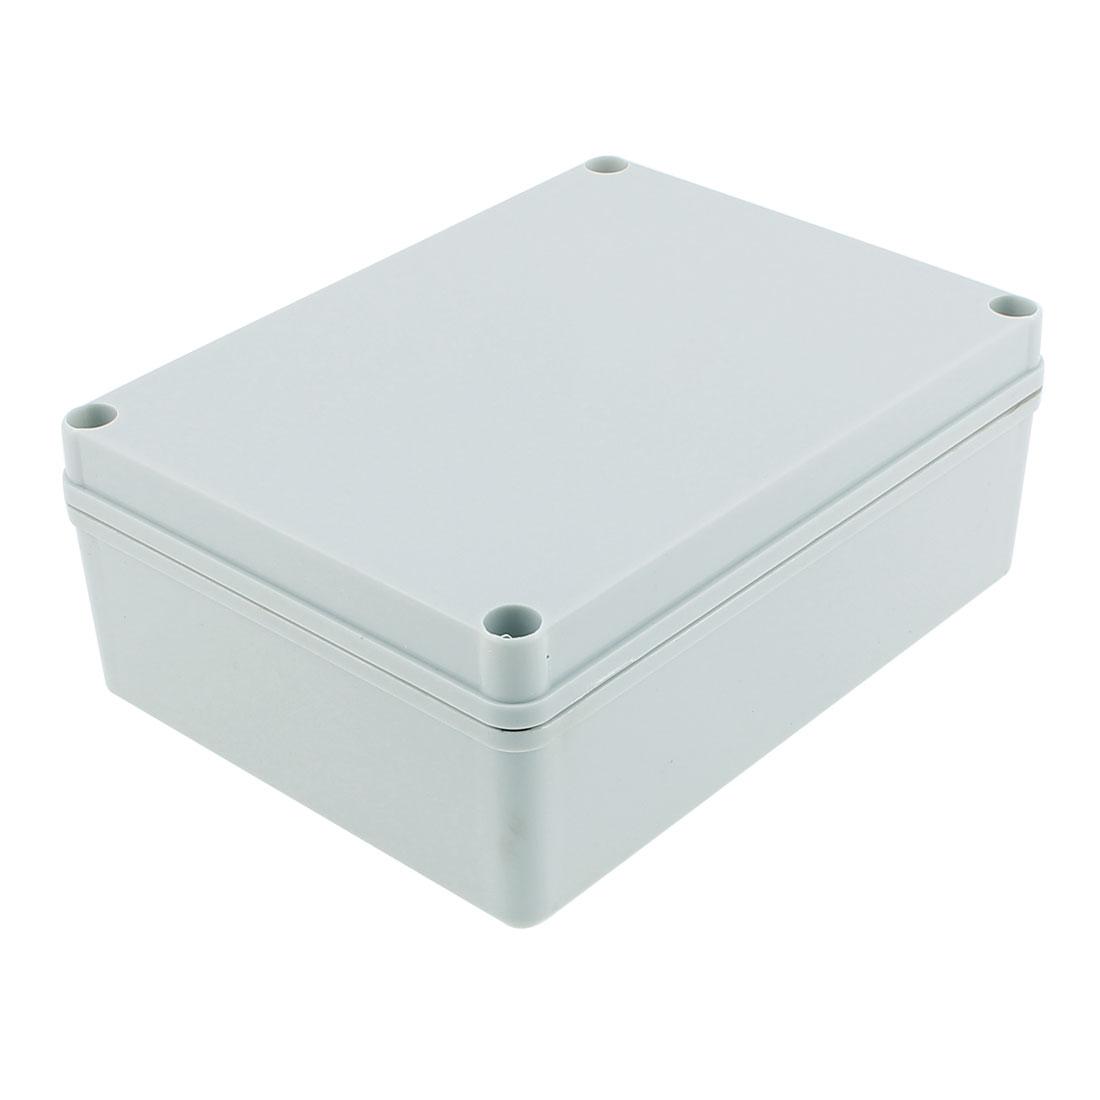 200 x 150 x 75mm Dustproof IP65 Junction Box Terminal Connection Box Enclosure